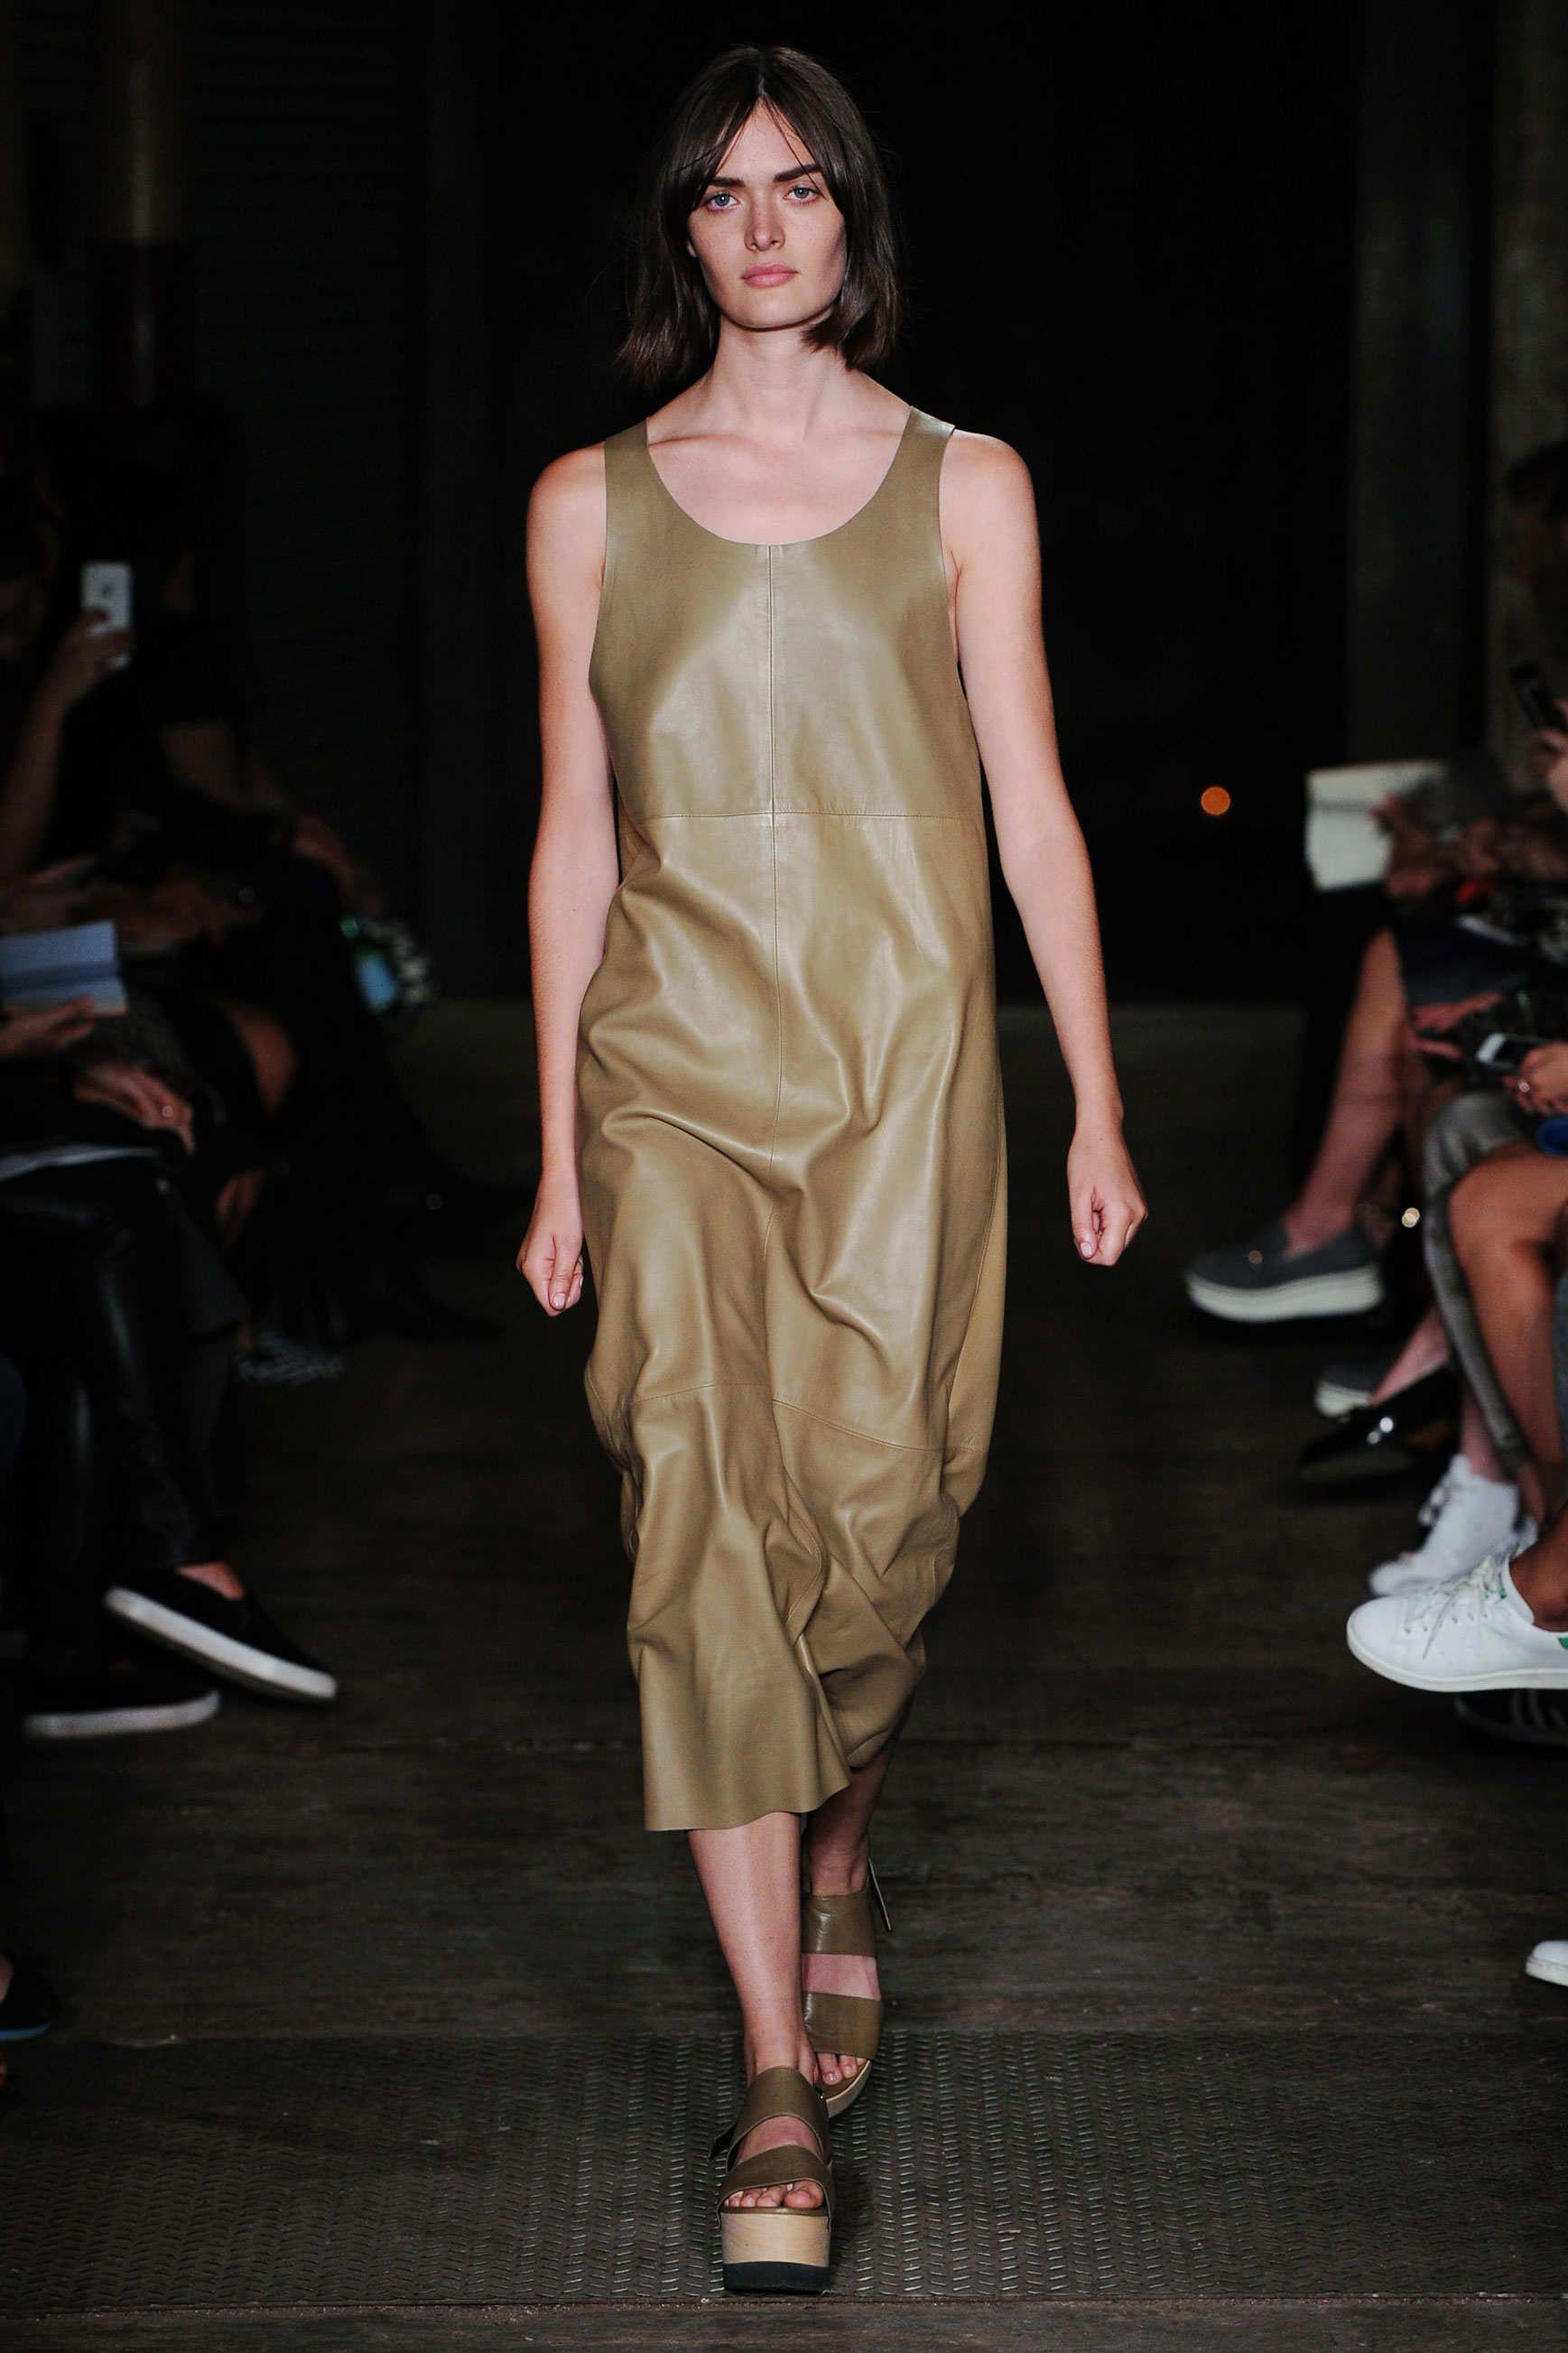 Joseph Fashion, Runway fashion looks, Ready to wear